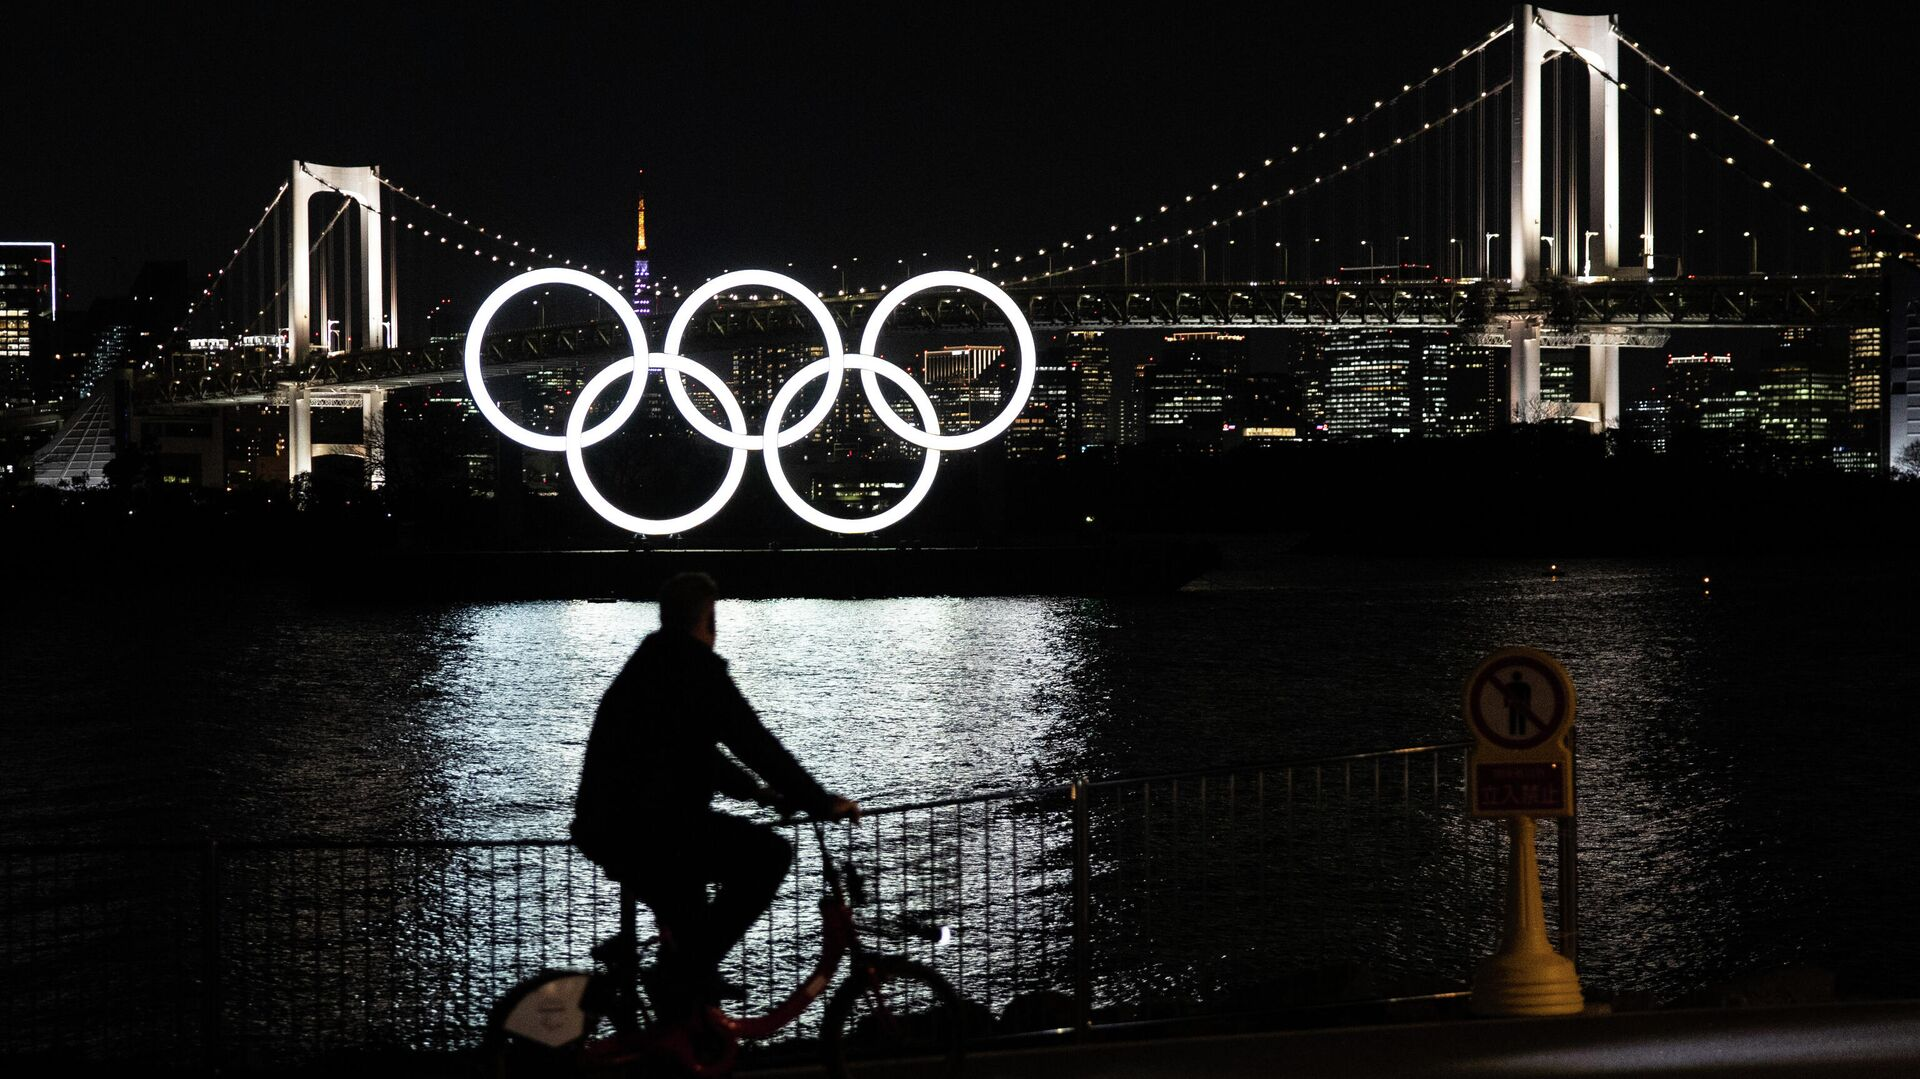 Олимпийские кольца в Токио - РИА Новости, 1920, 07.04.2021